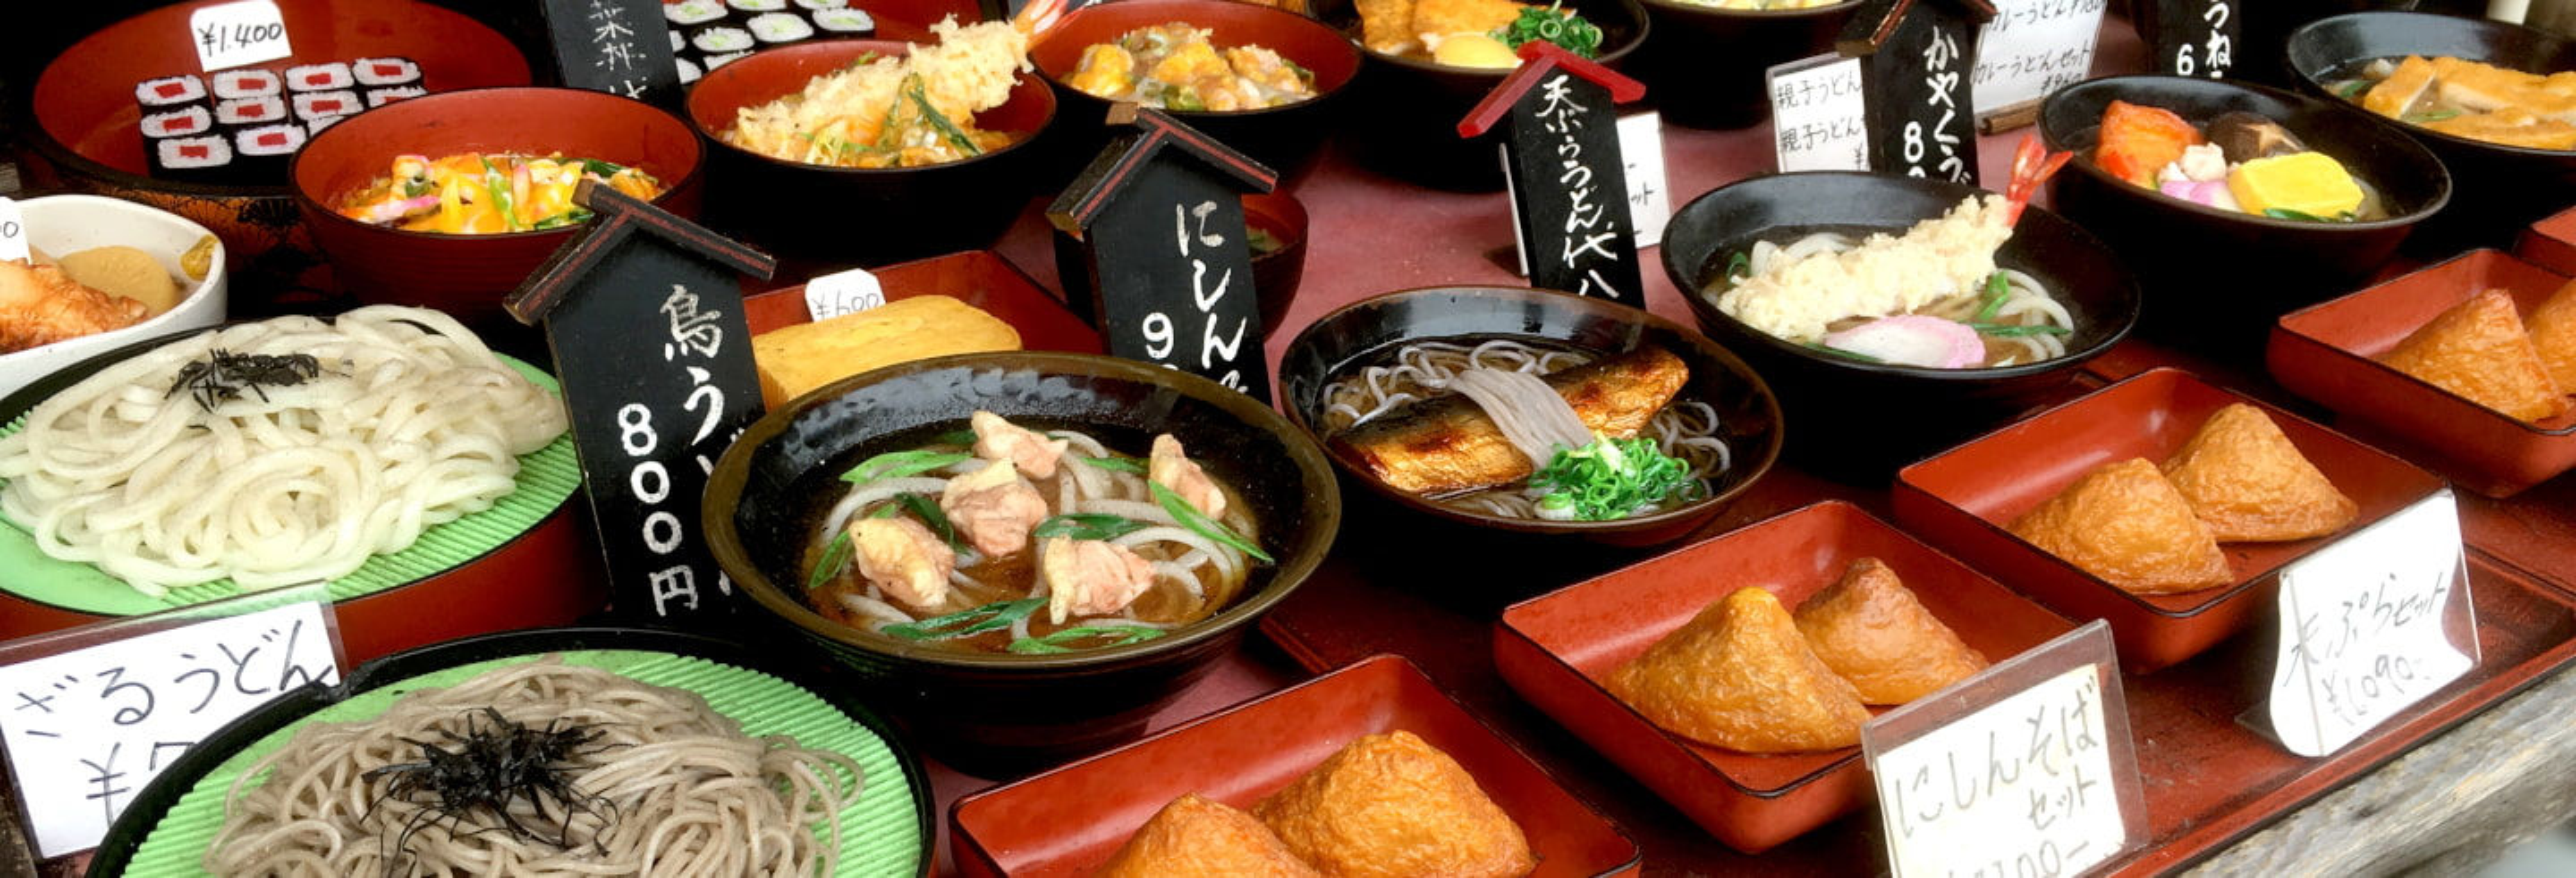 Tour gastronómico por Kioto